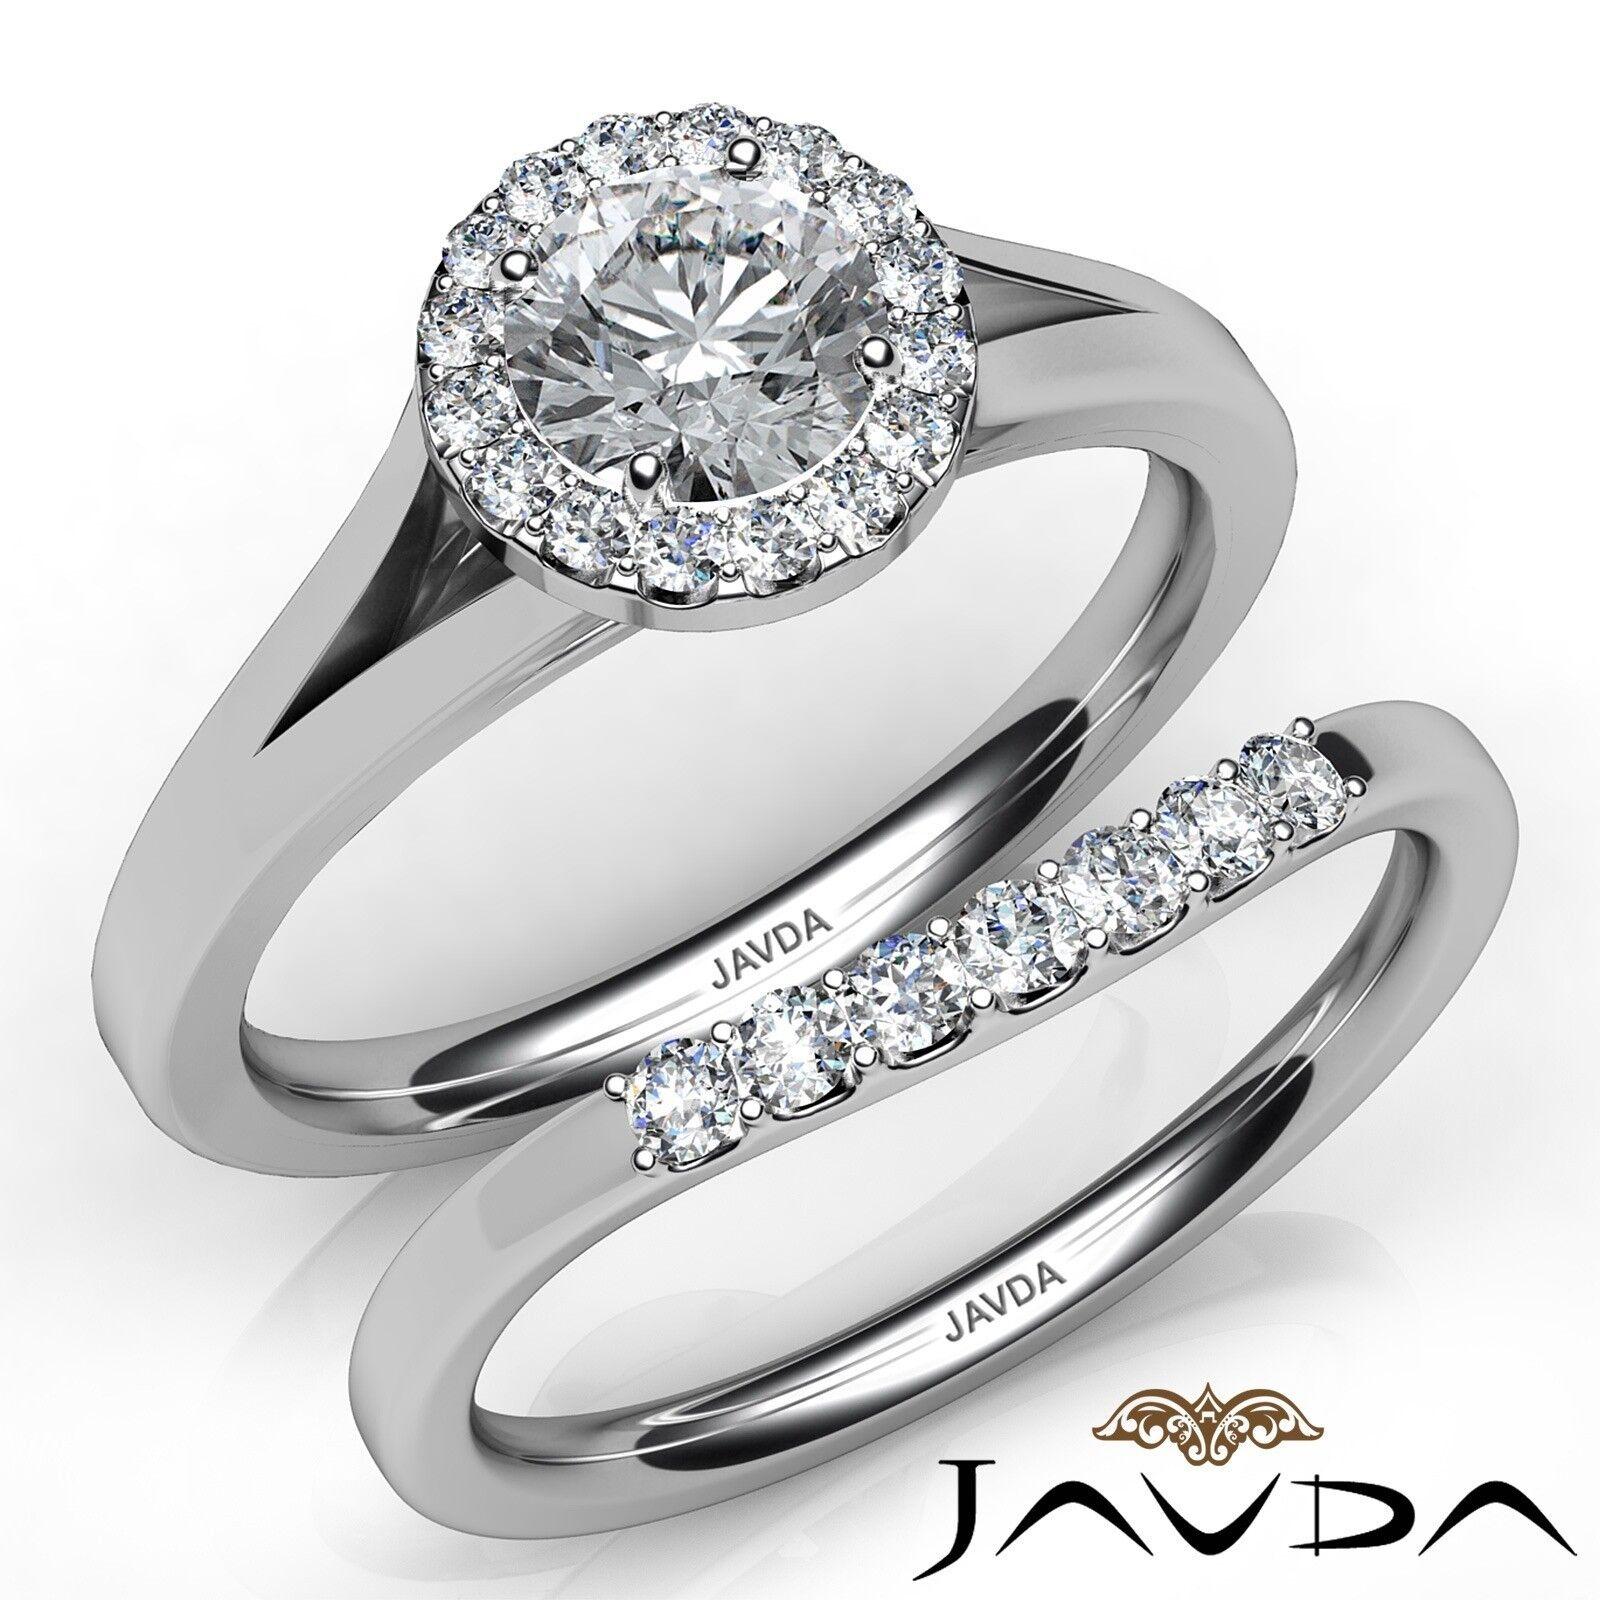 0.92ctw Classic Bridal Halo Pave Round Diamond Engagement Ring GIA I-VS1 W Gold